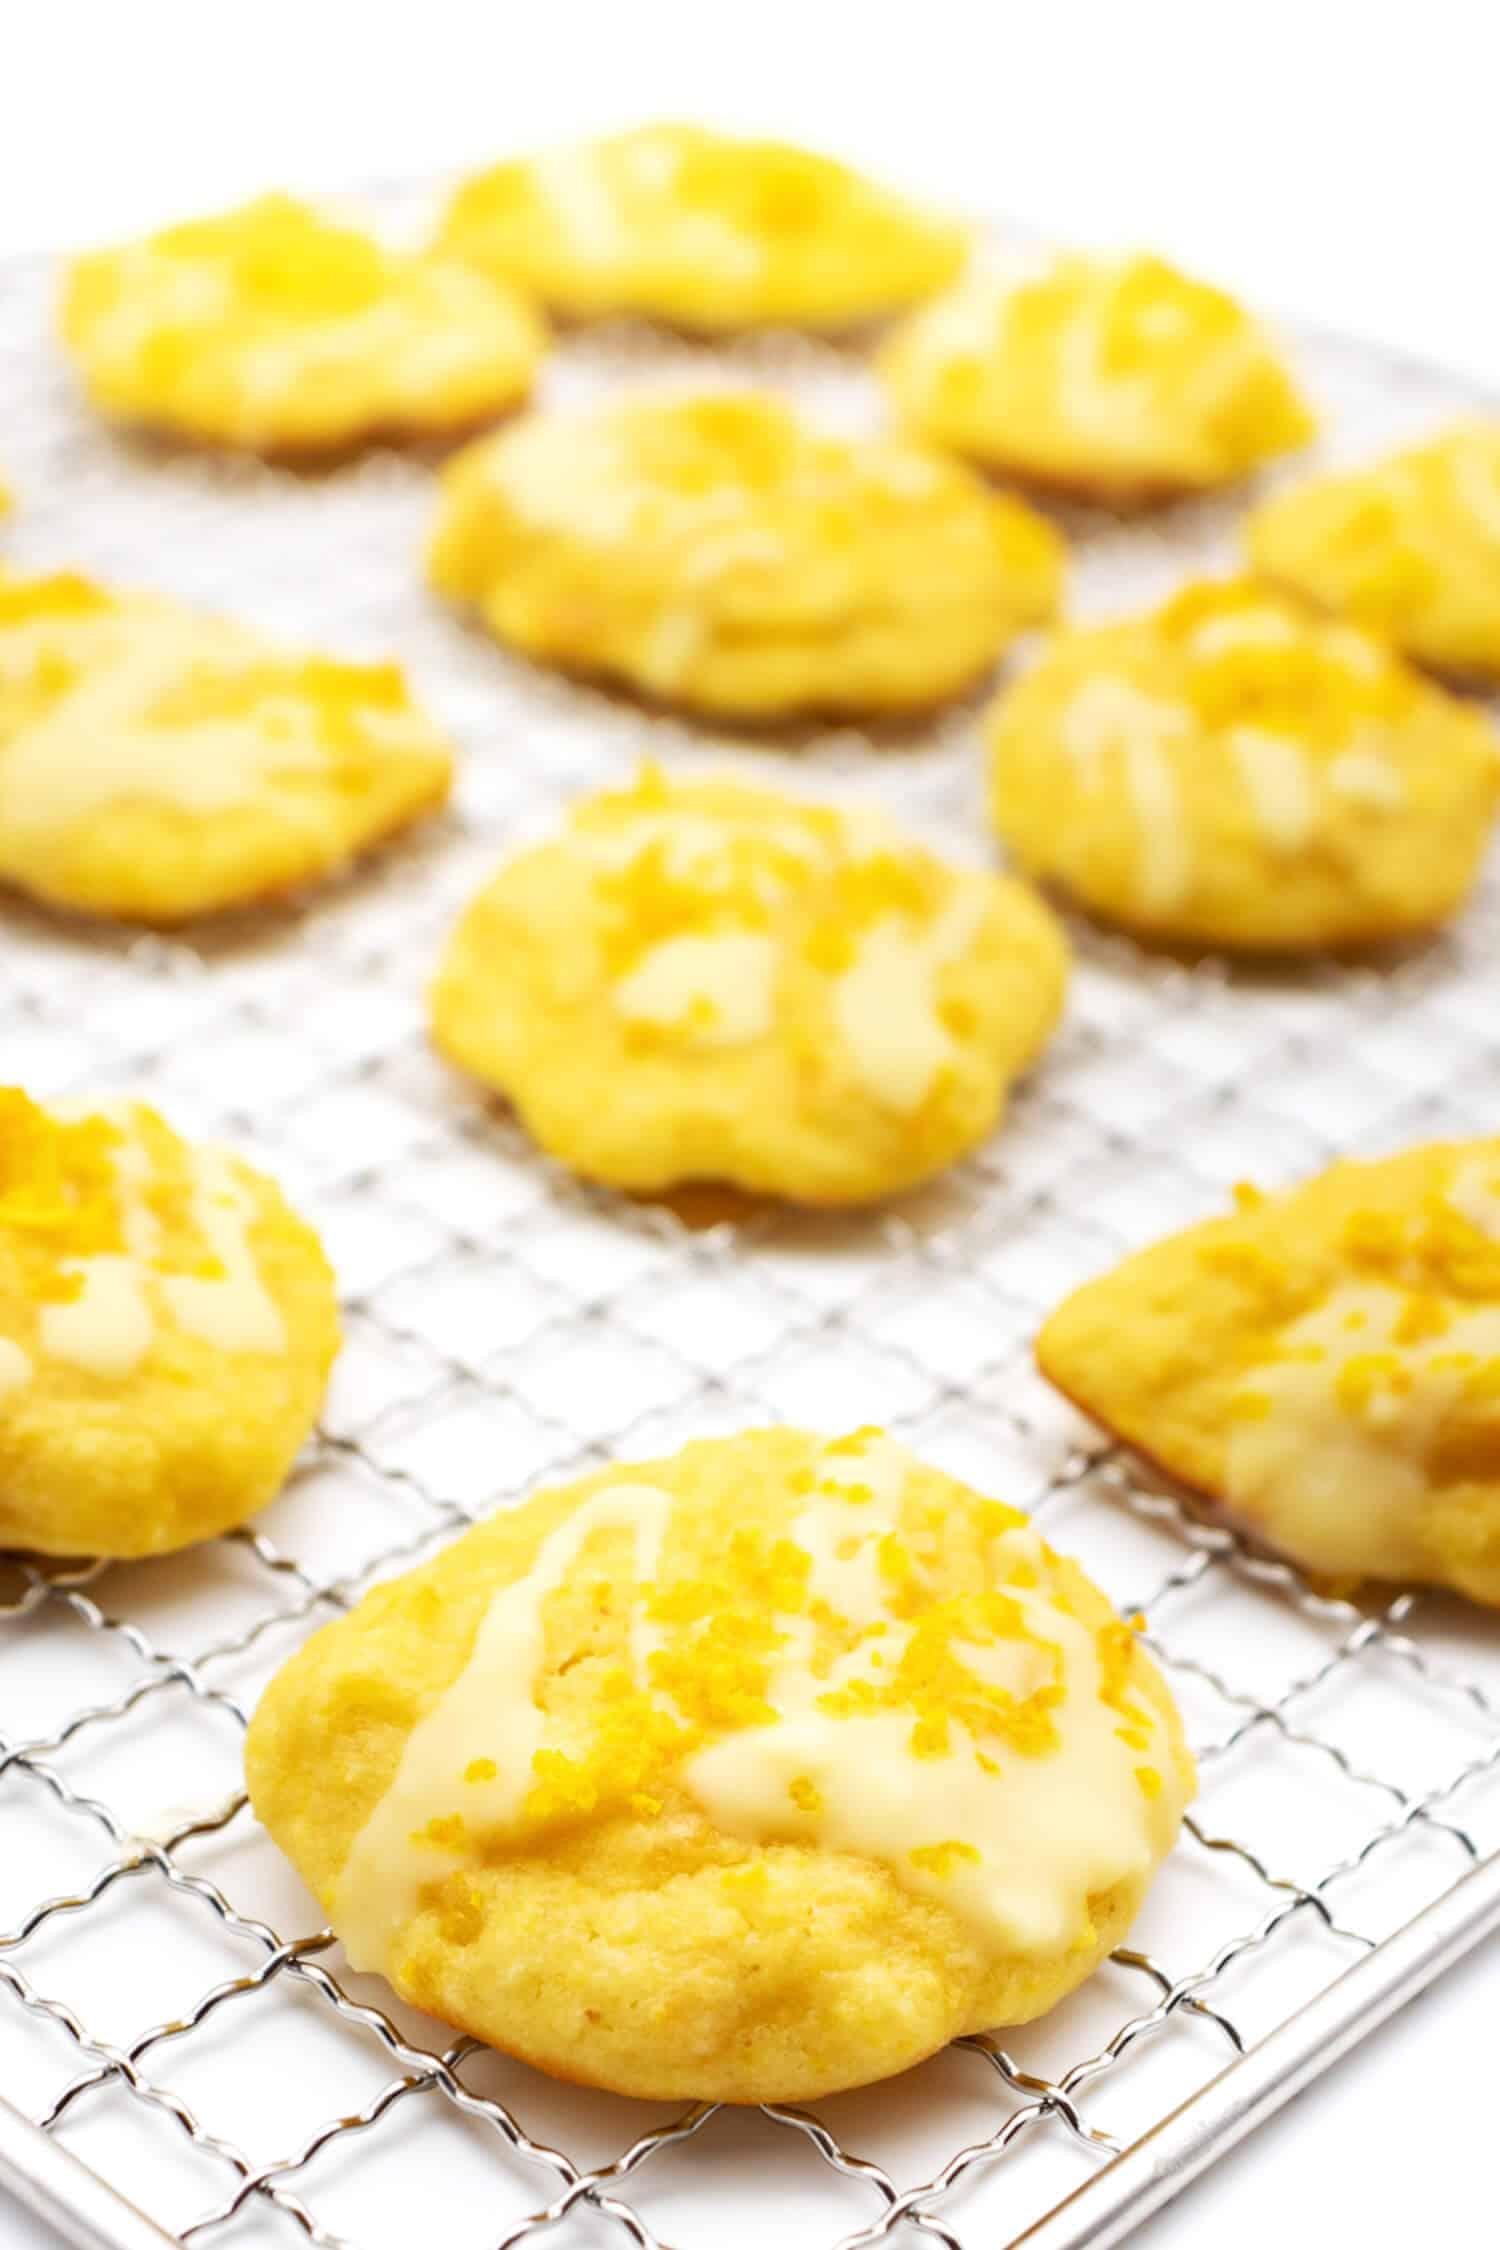 Einfache Low Carb Kekse backen ohne Zucker